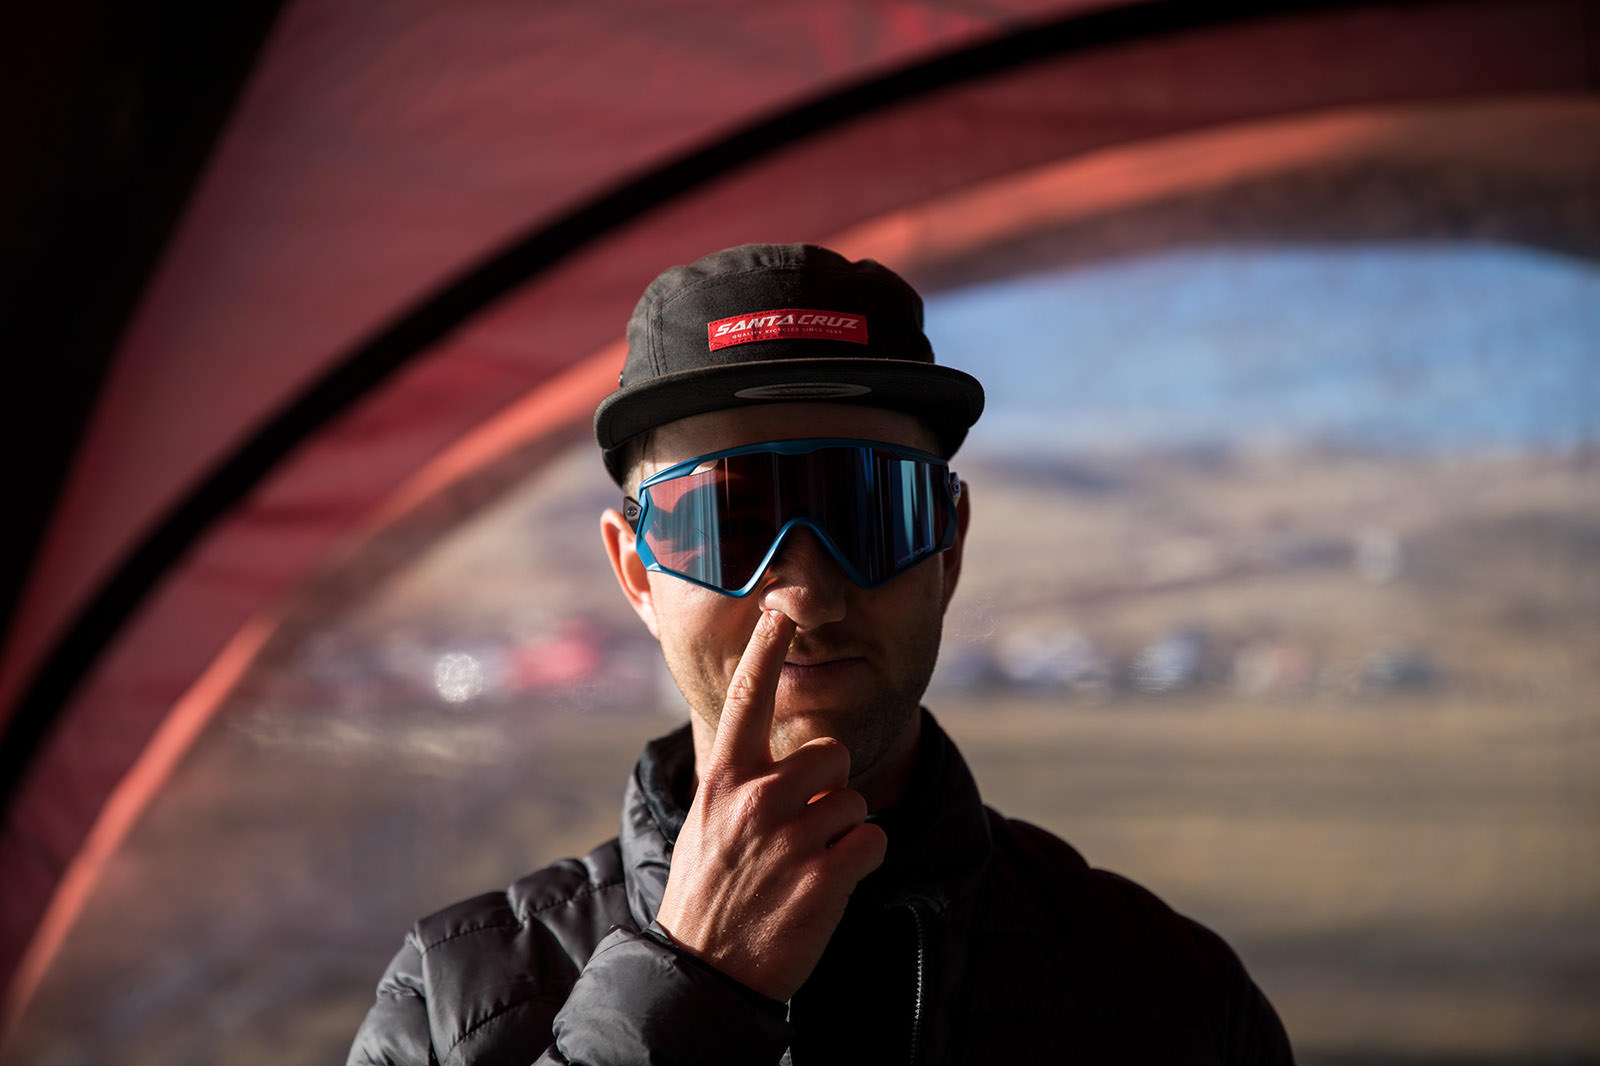 Tobin Ortenblad - Santa Cruz Bicycles - Cyclocross National Championships